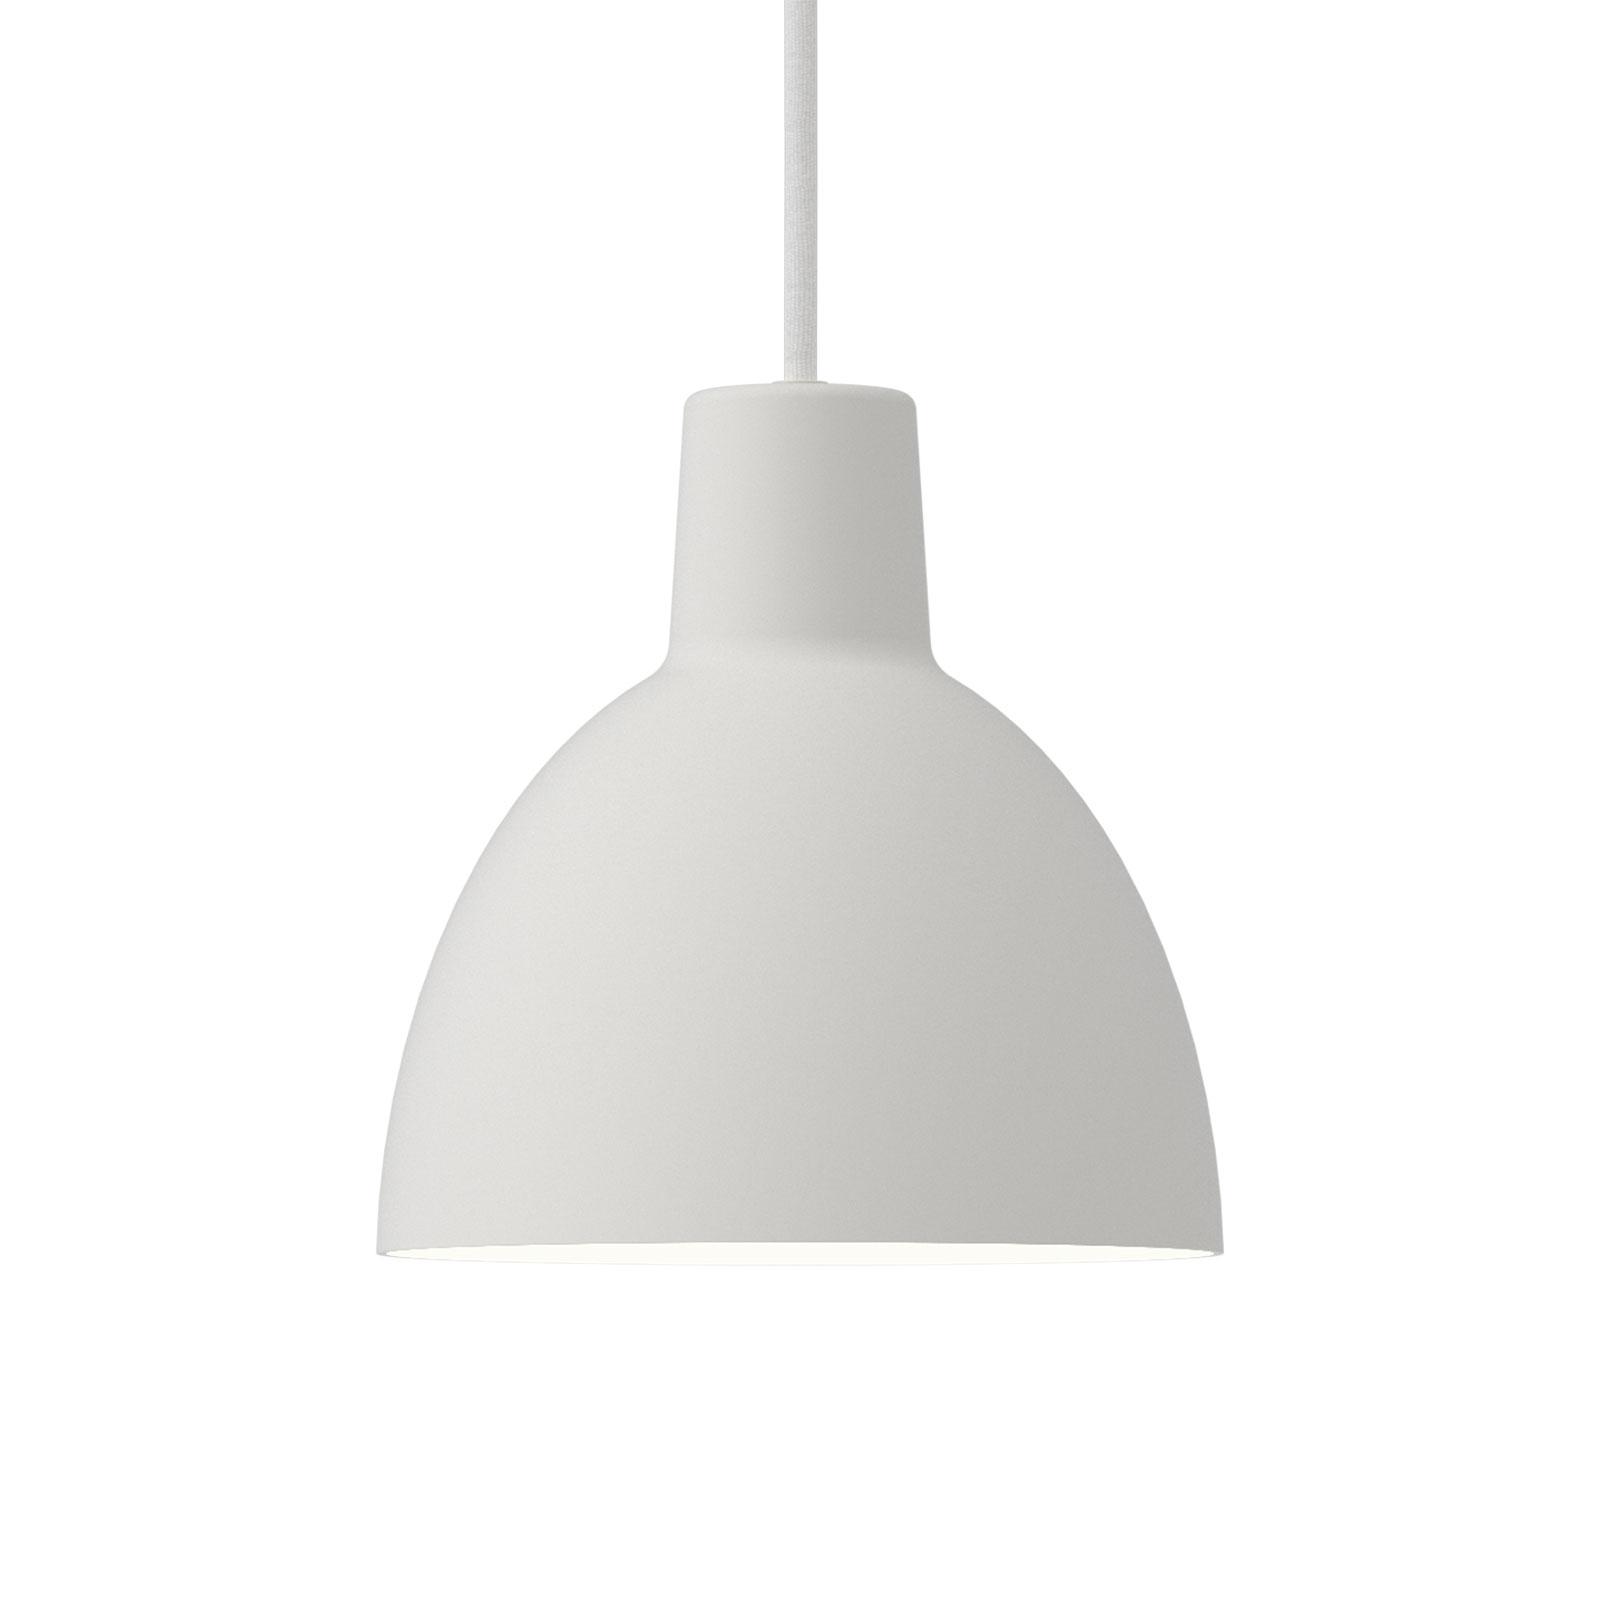 Louis Poulsen Toldbod 170 pendellampe, hvit